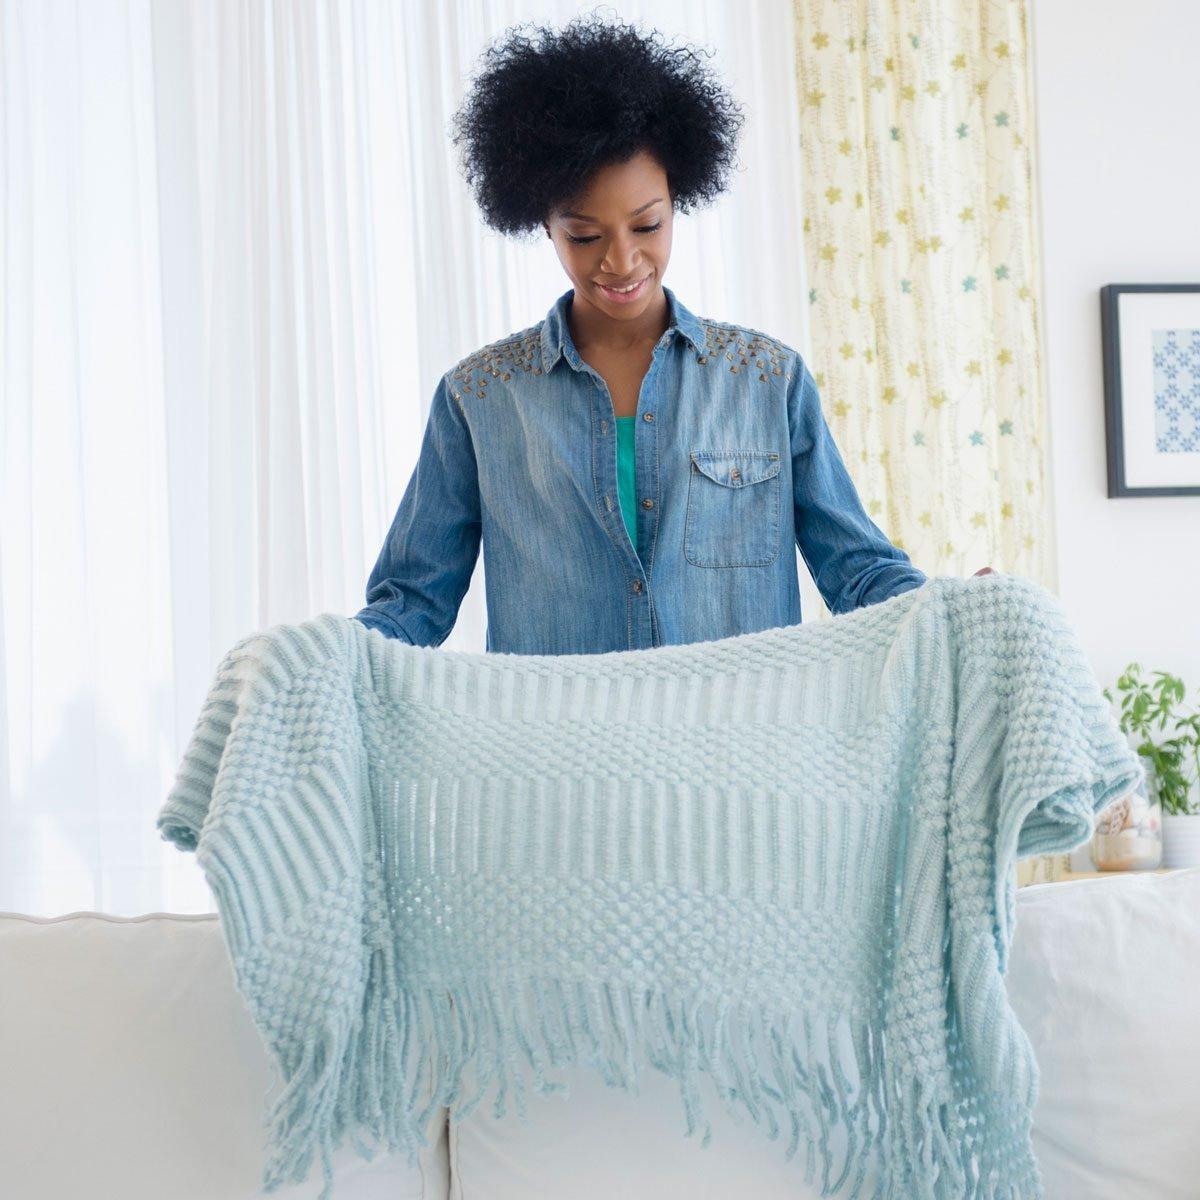 Folding Blanket Storage Gettyimages 514411063